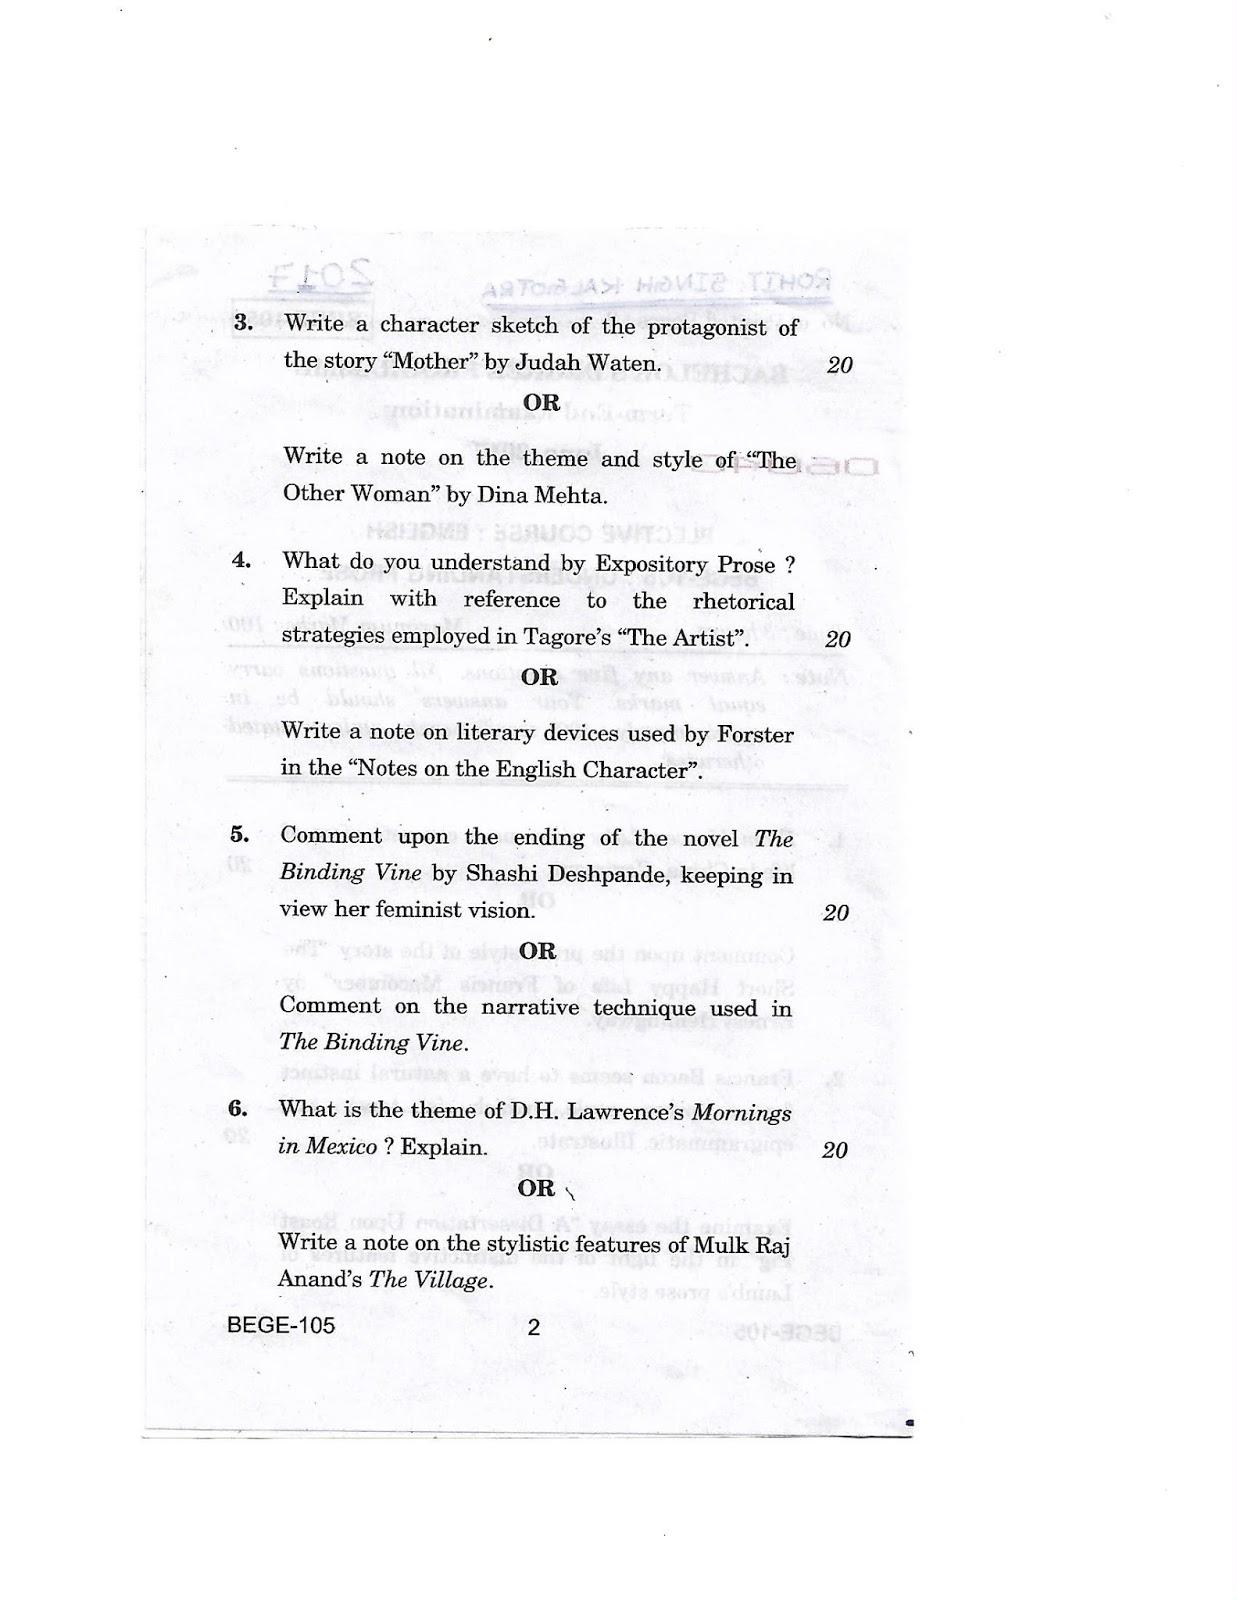 bege 101 question paper